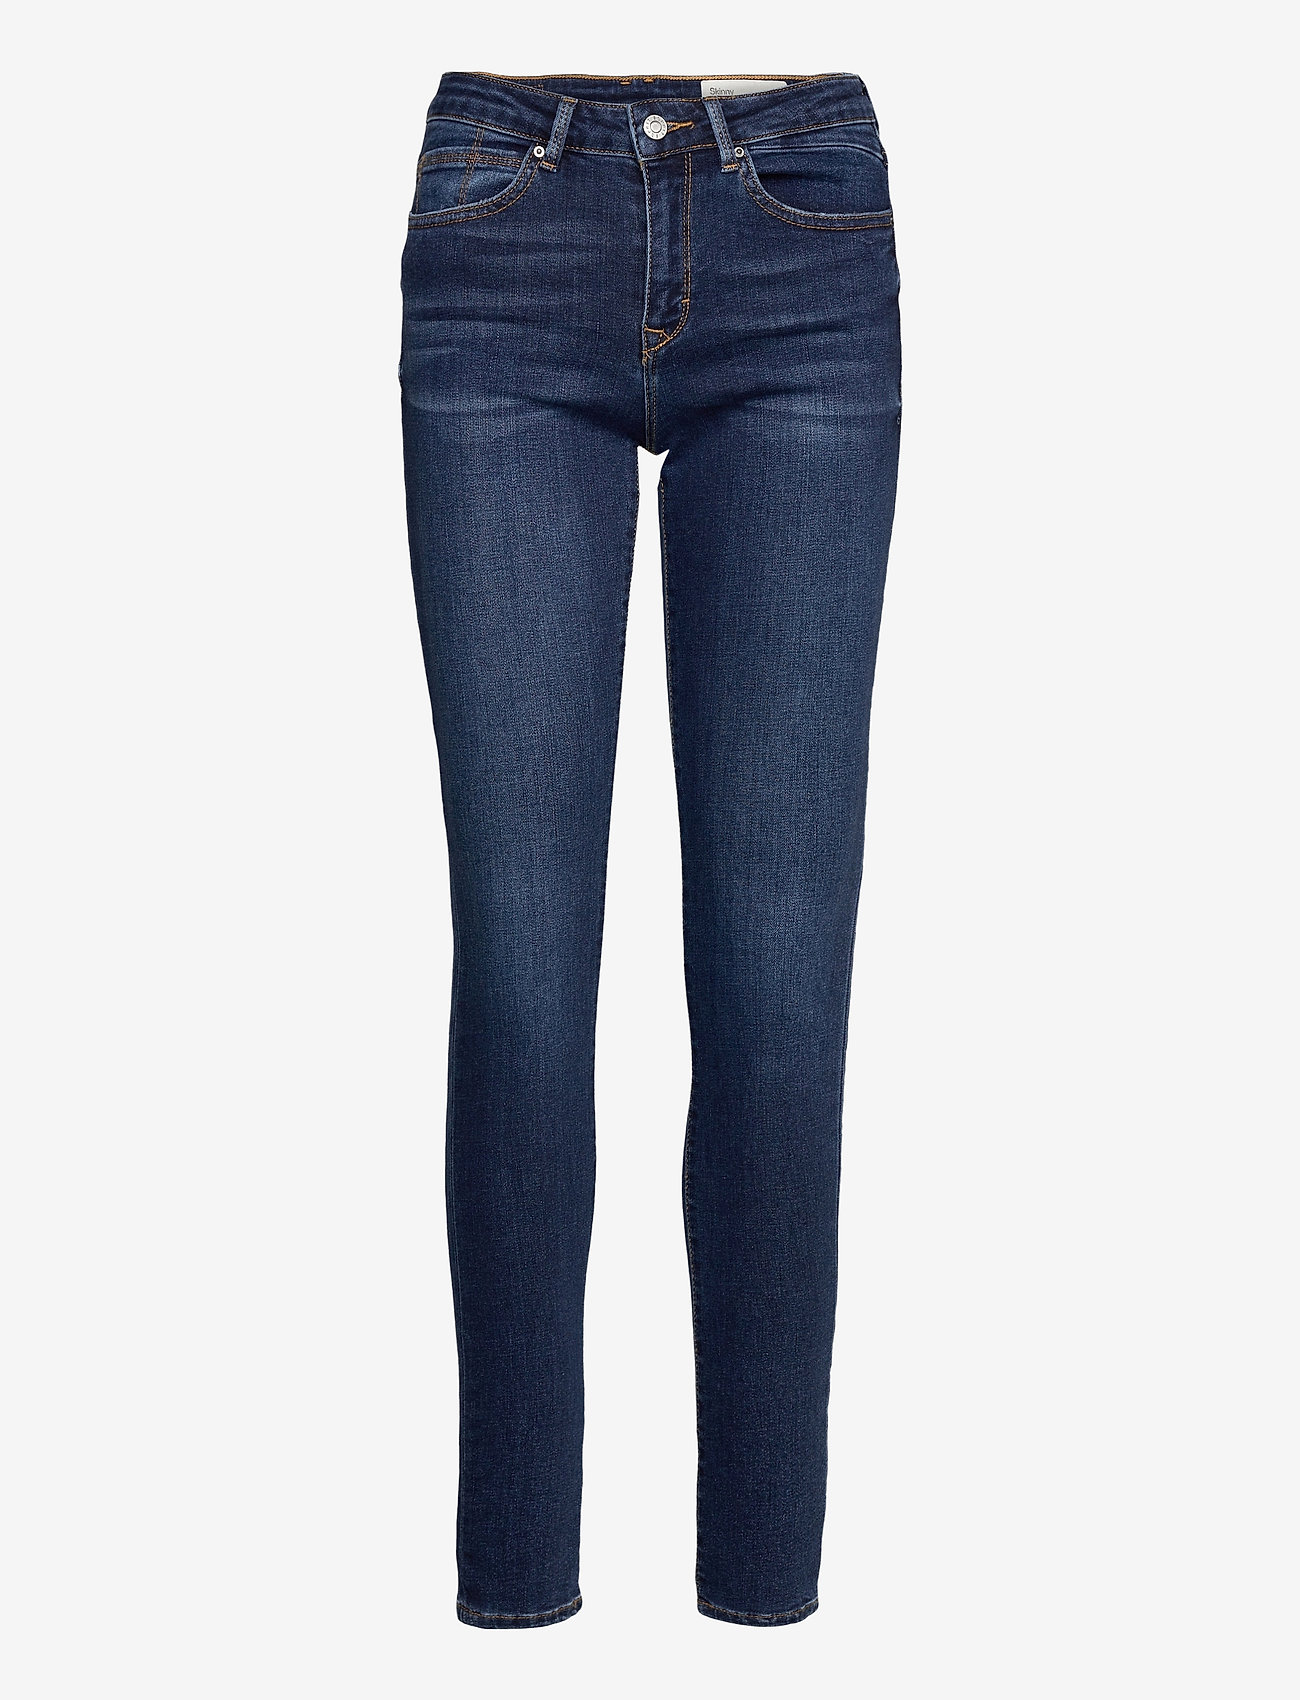 Esprit Casual - Pants denim - skinny jeans - blue medium wash - 0